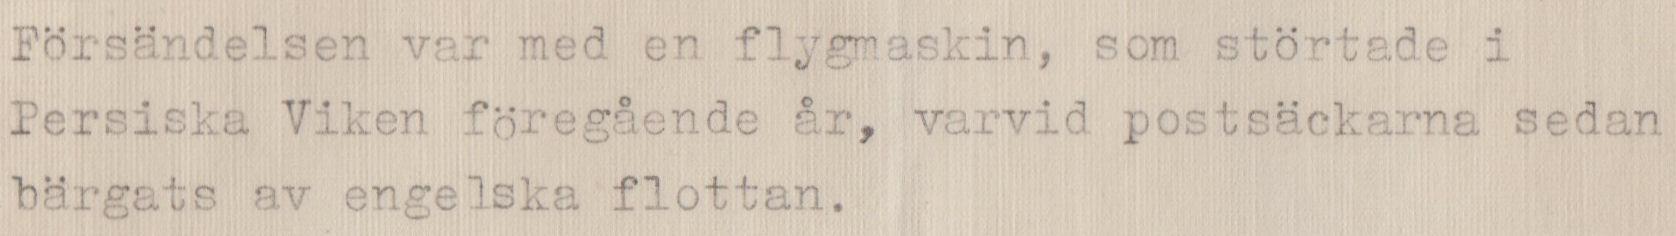 19470823 A